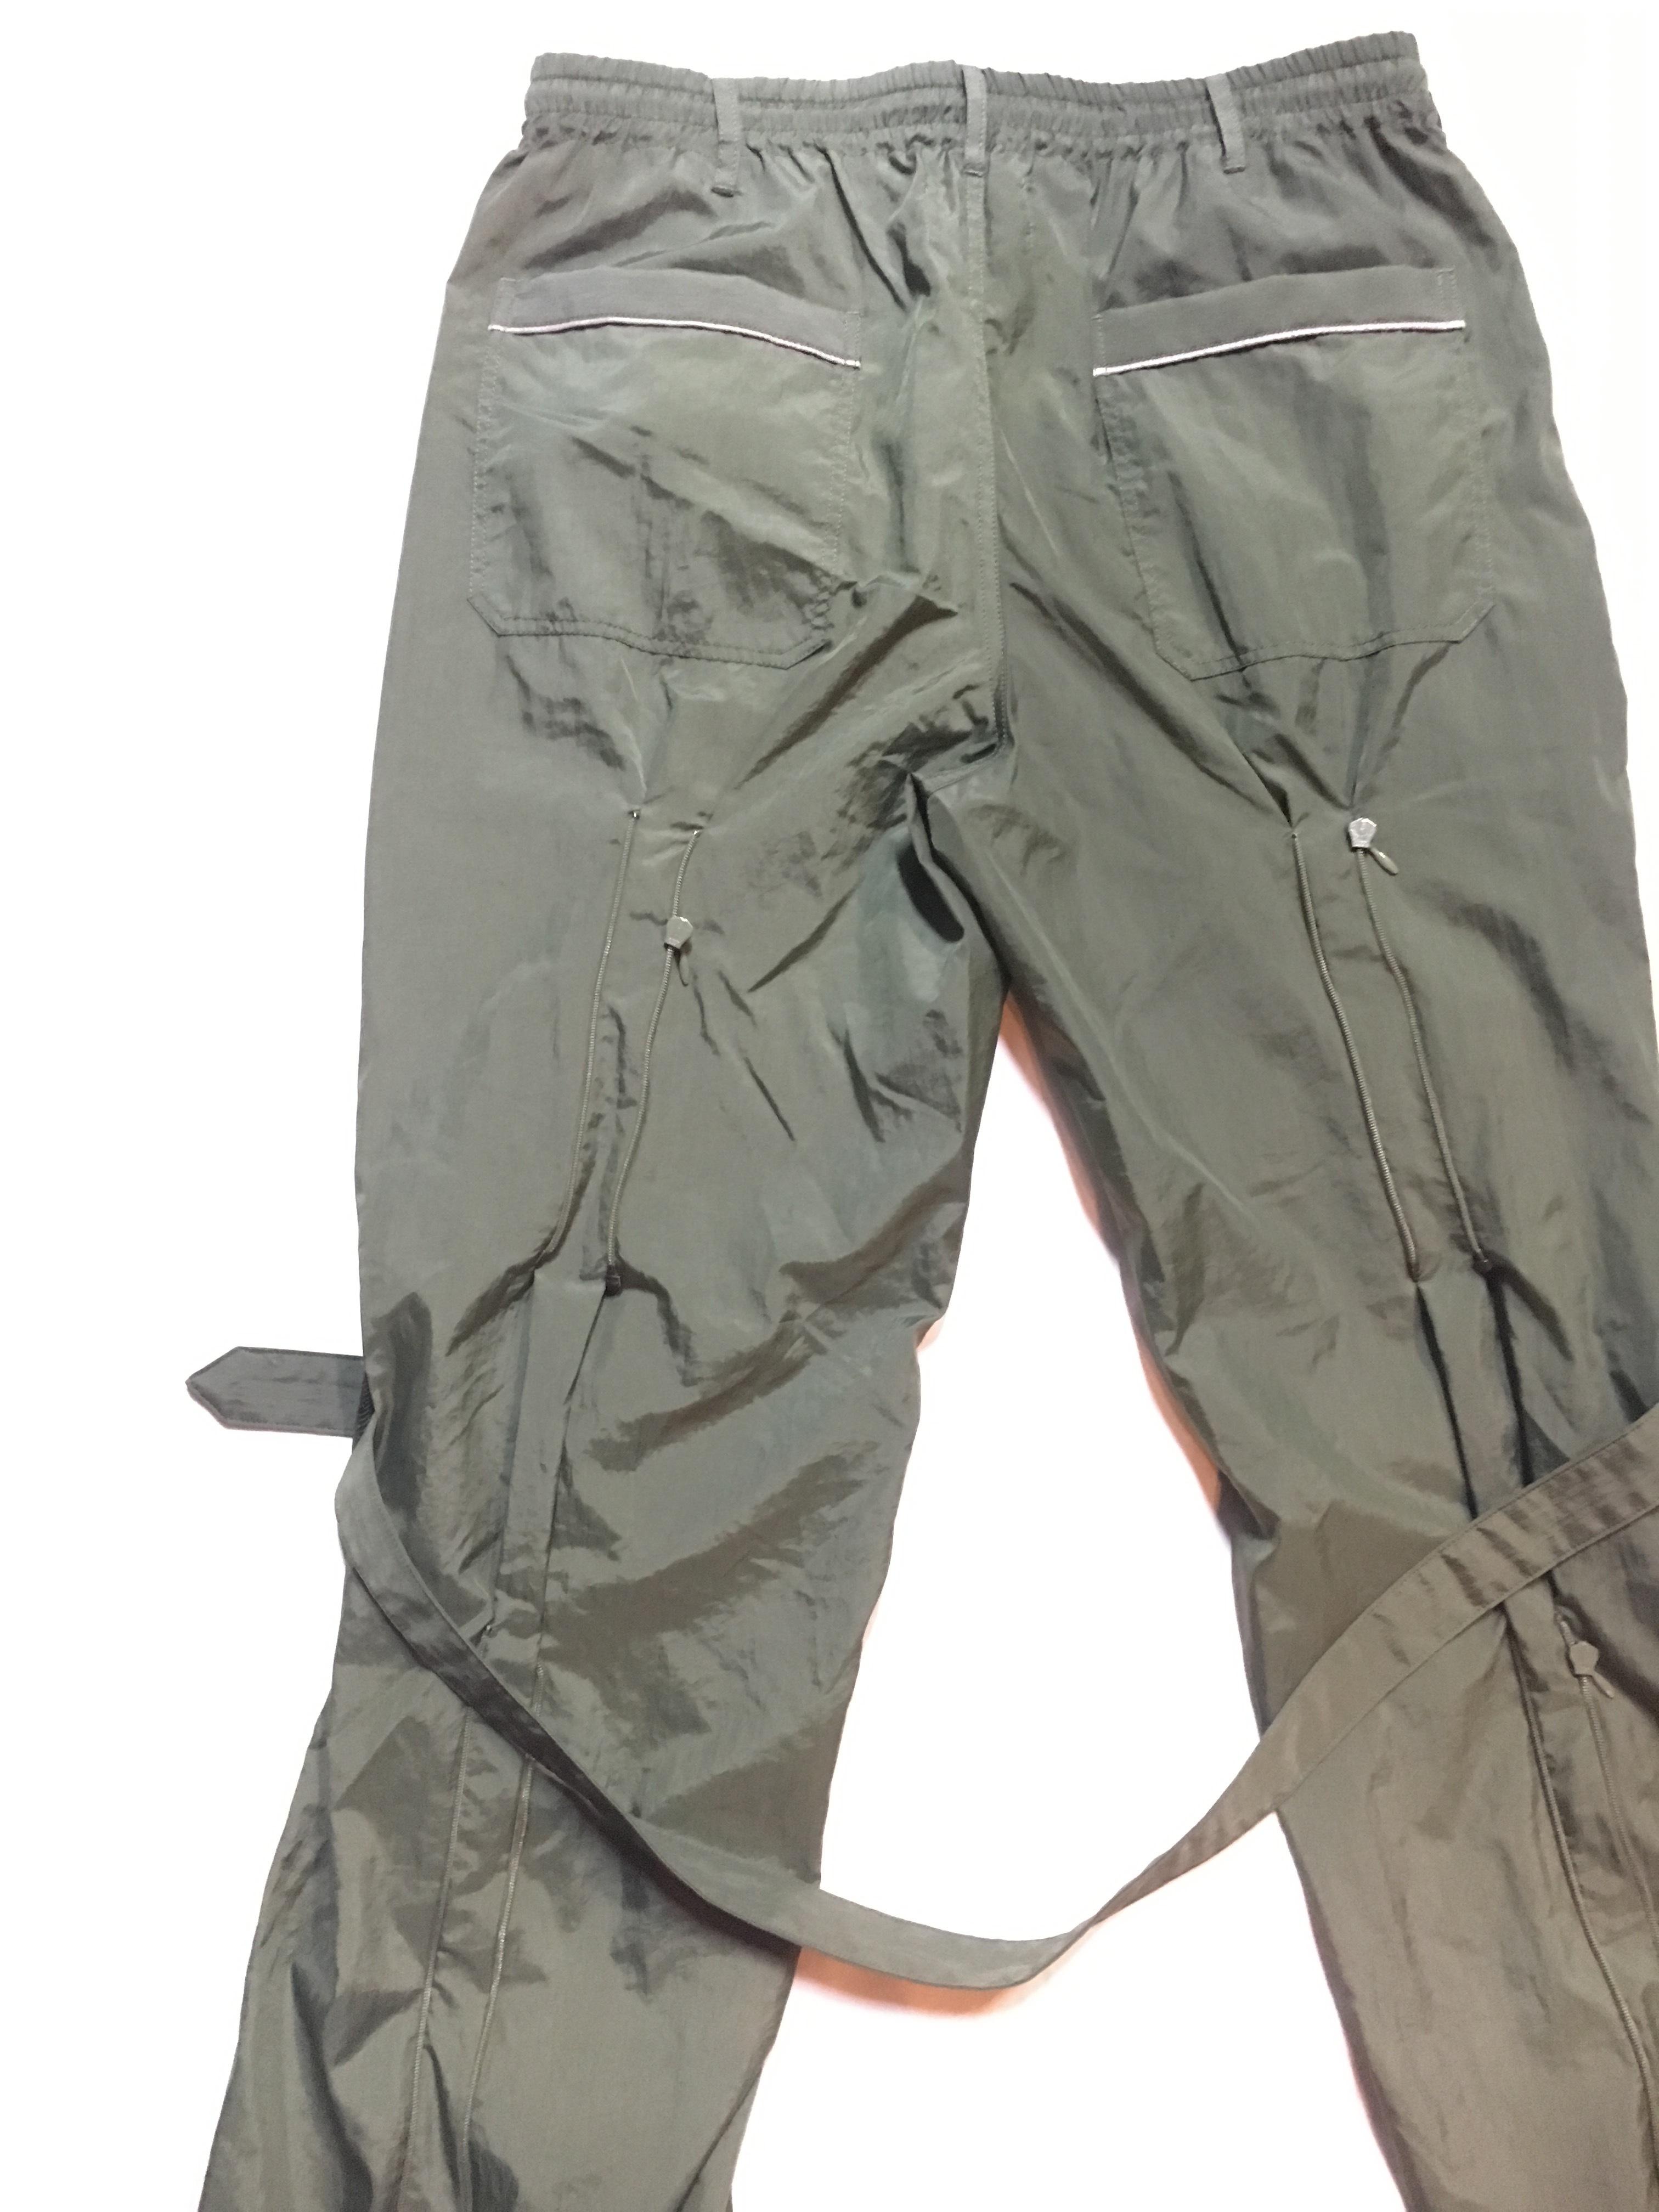 SKIN / nylon bondage pants(olive) - 画像4